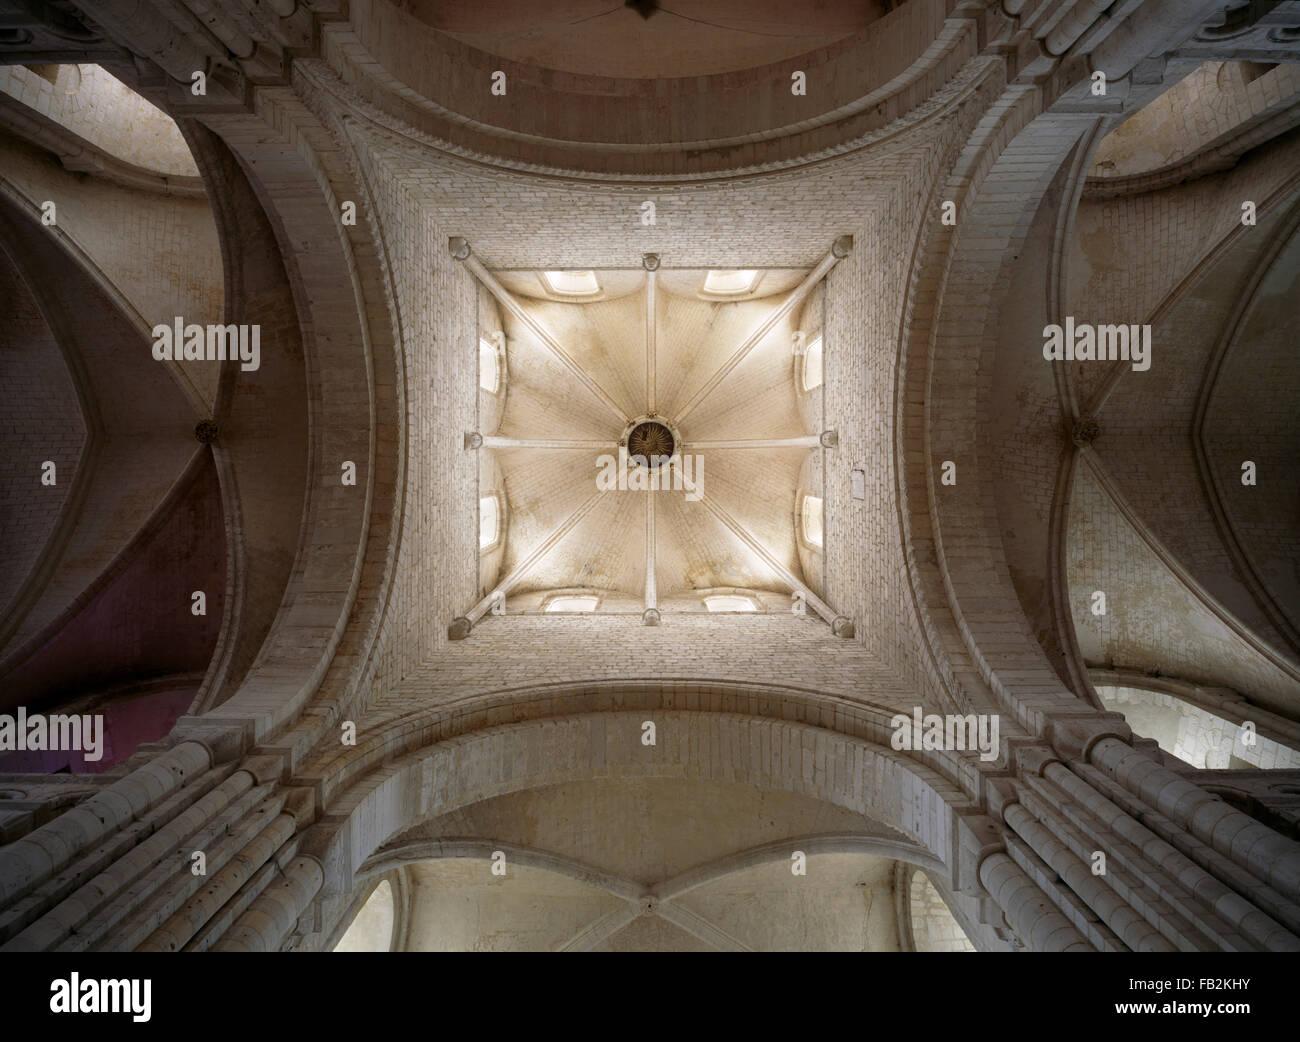 Saint-Martin-de-Boscherville, Abteikirche, Blick in den Vierungsturm - Stock Image